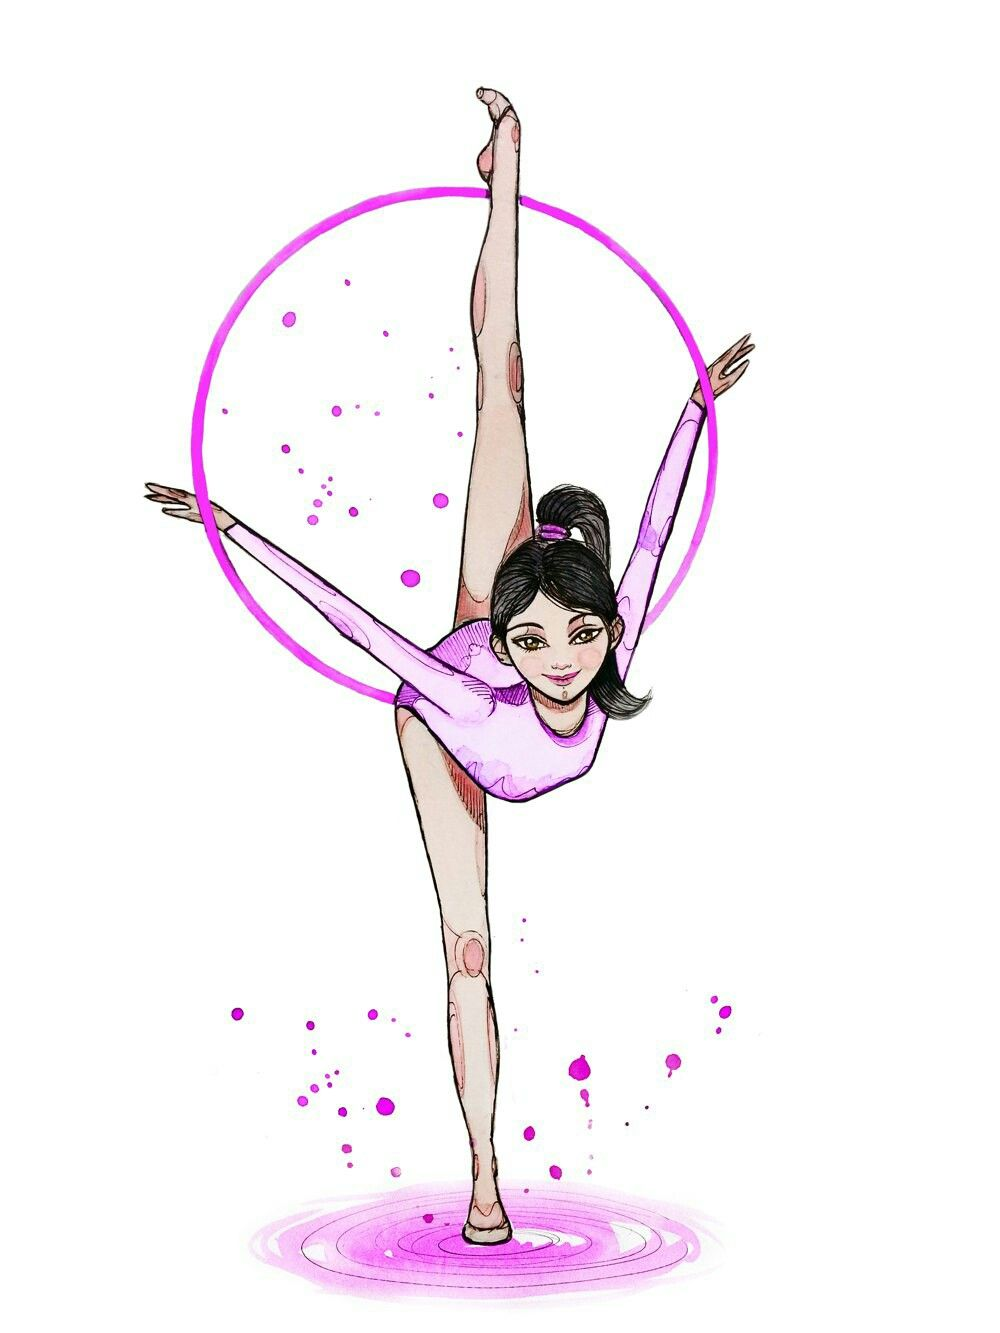 картинки гимнасток рисунки что конце хвоста